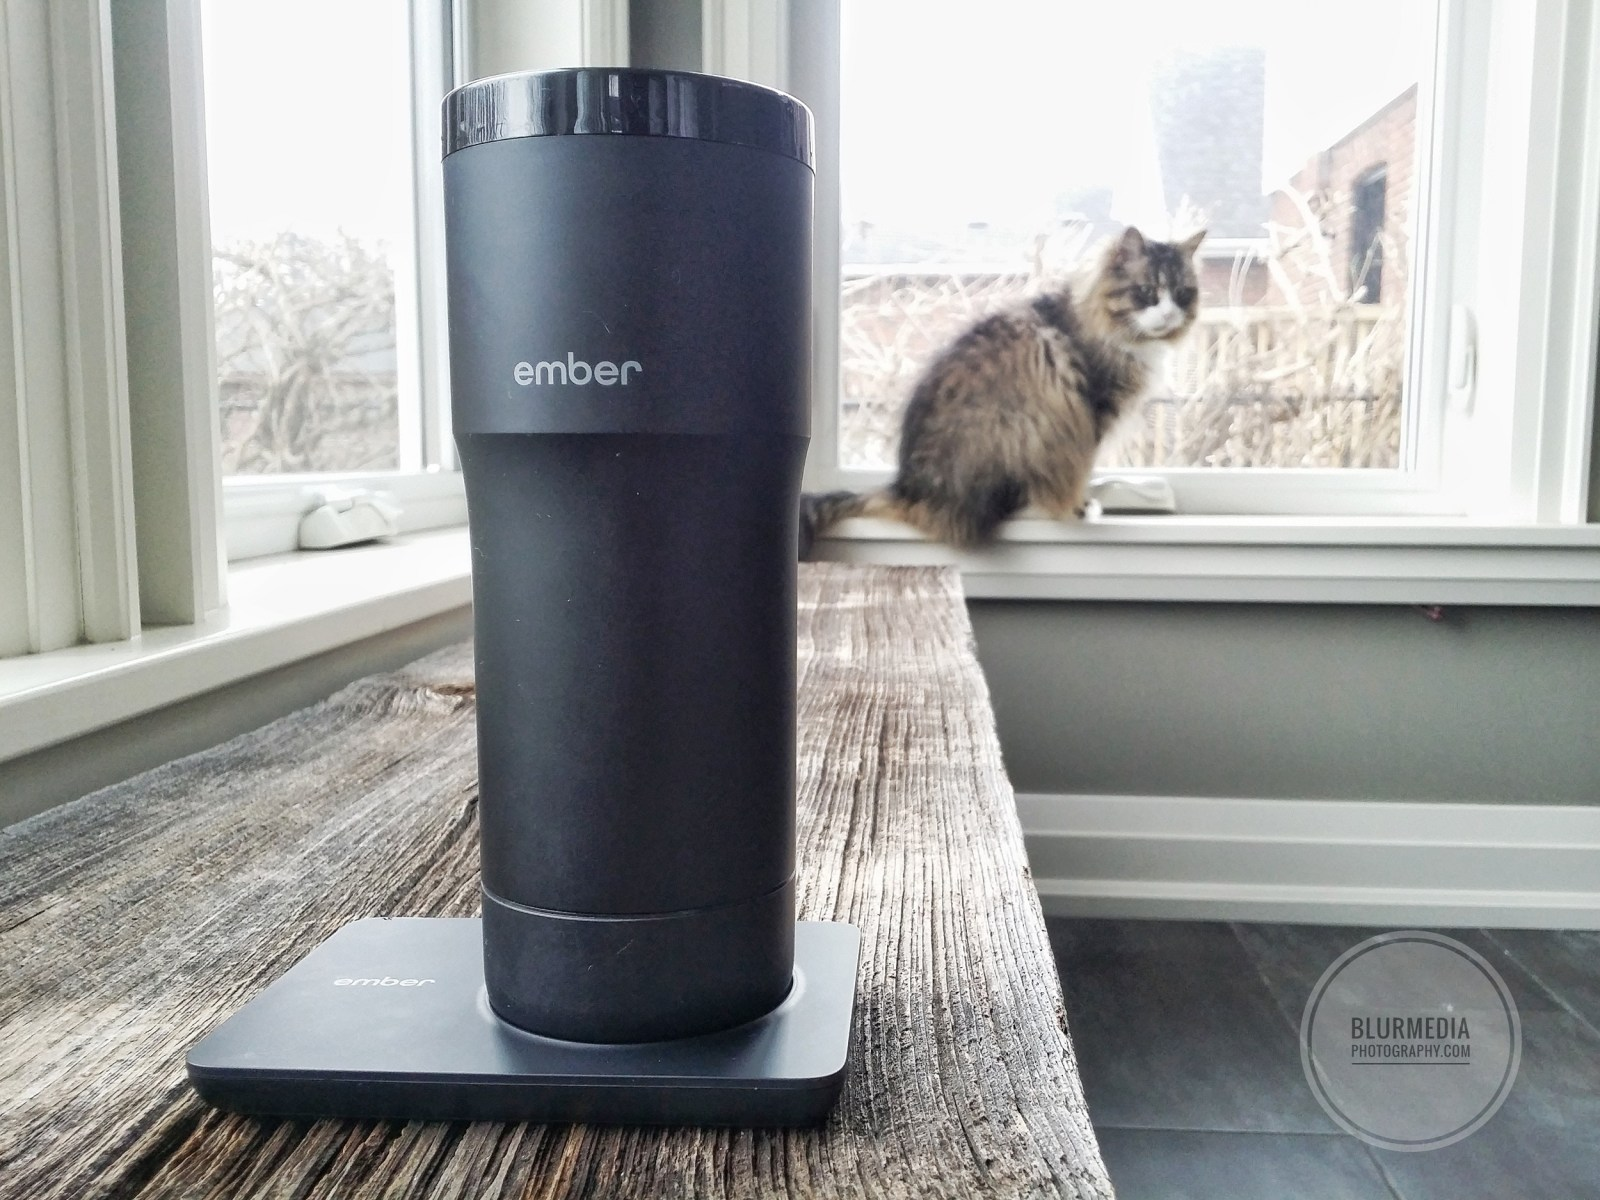 Ember Temperature Control Travel Mug Review